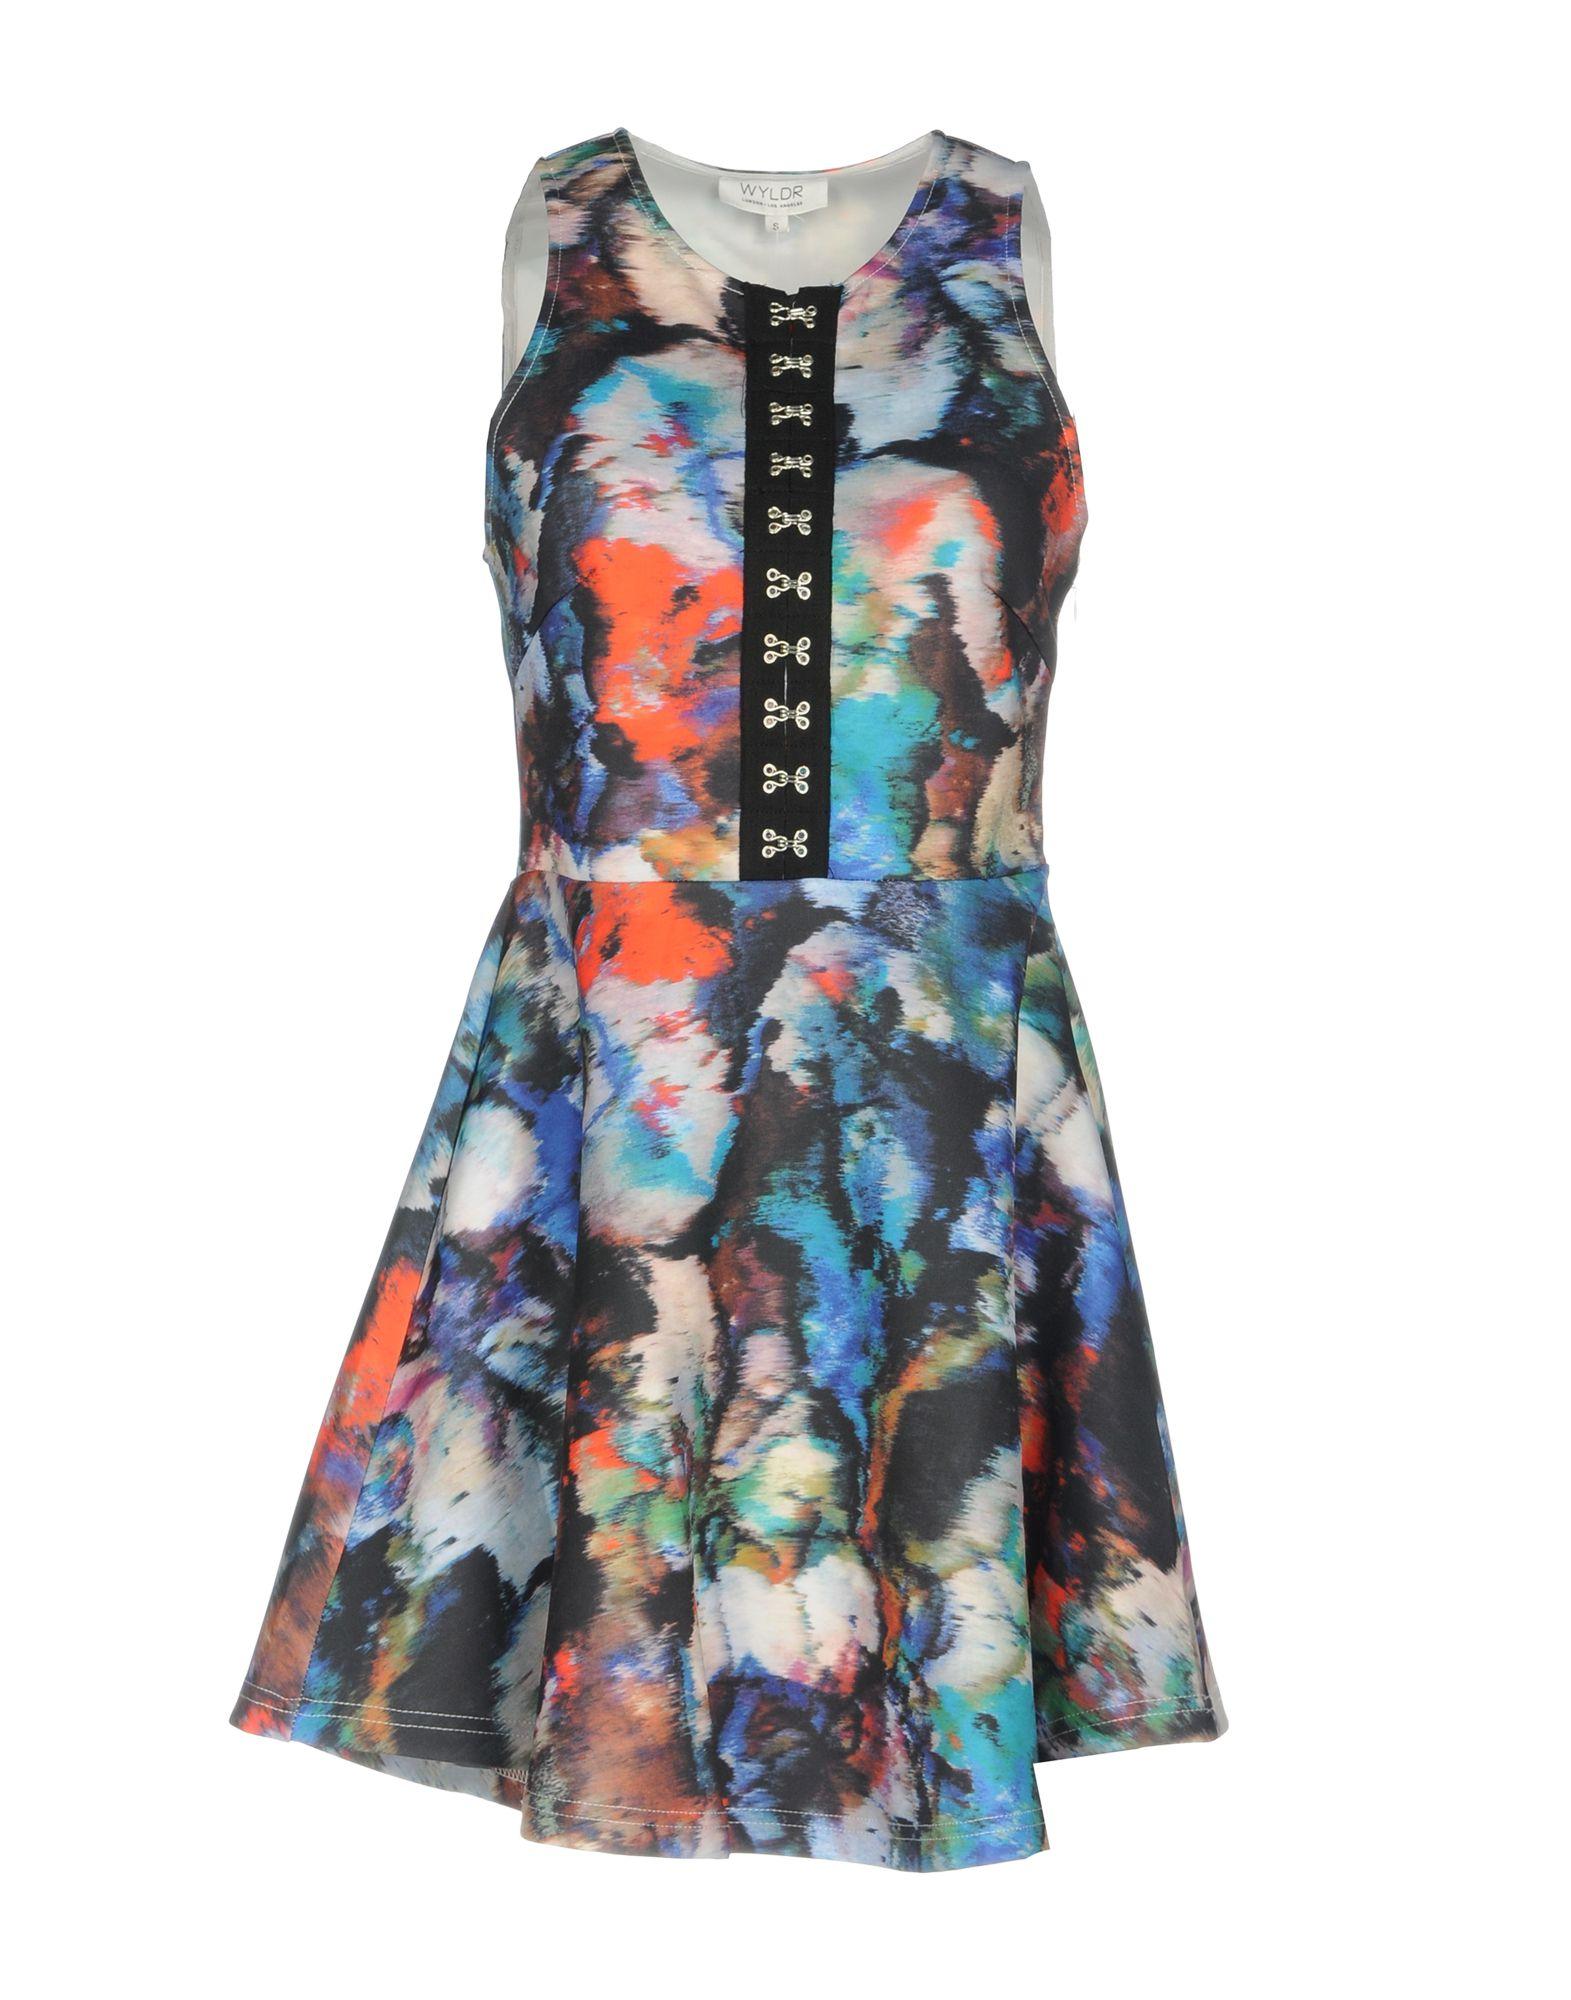 WYLDR Short Dress in Blue